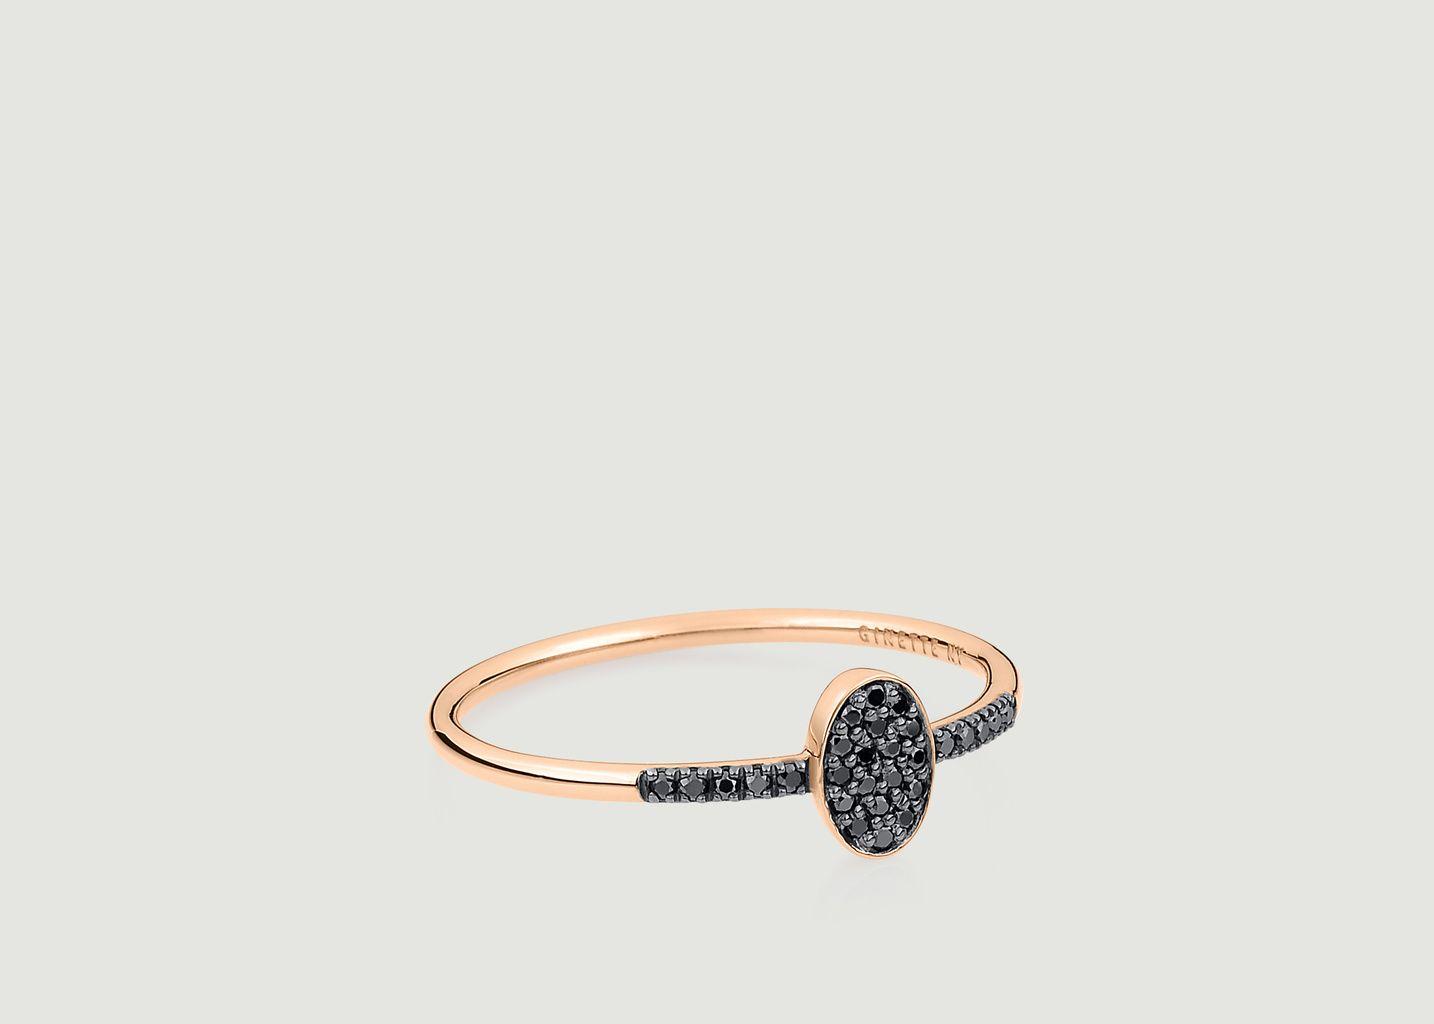 Bague Sequin Diamants Noirs - Ginette NY